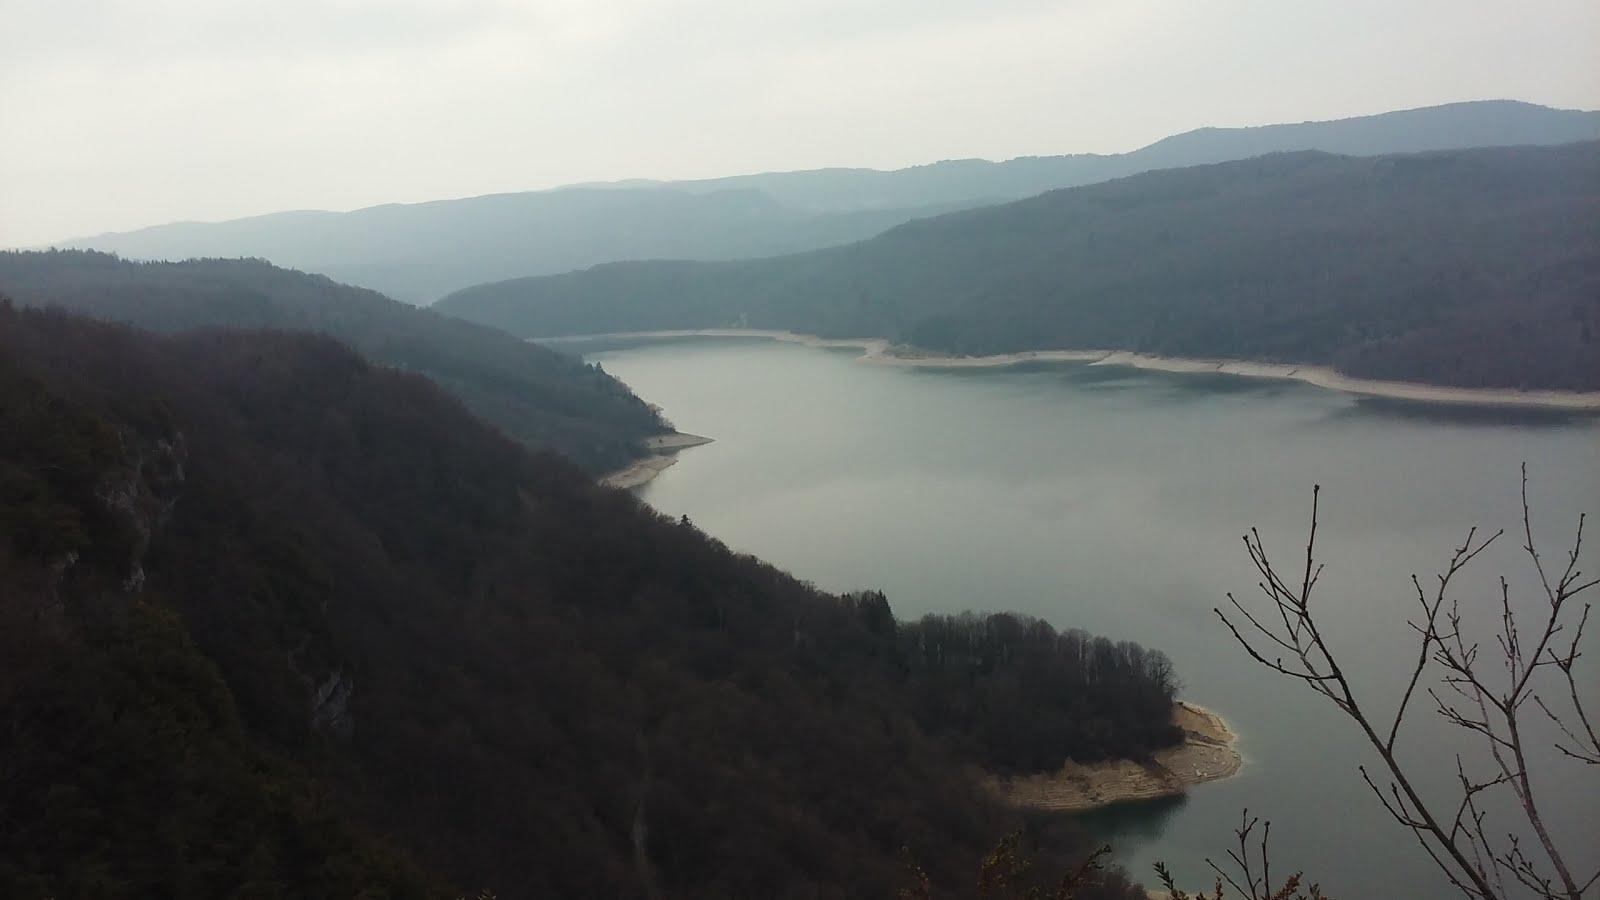 Moirans en Montagne (Jura)